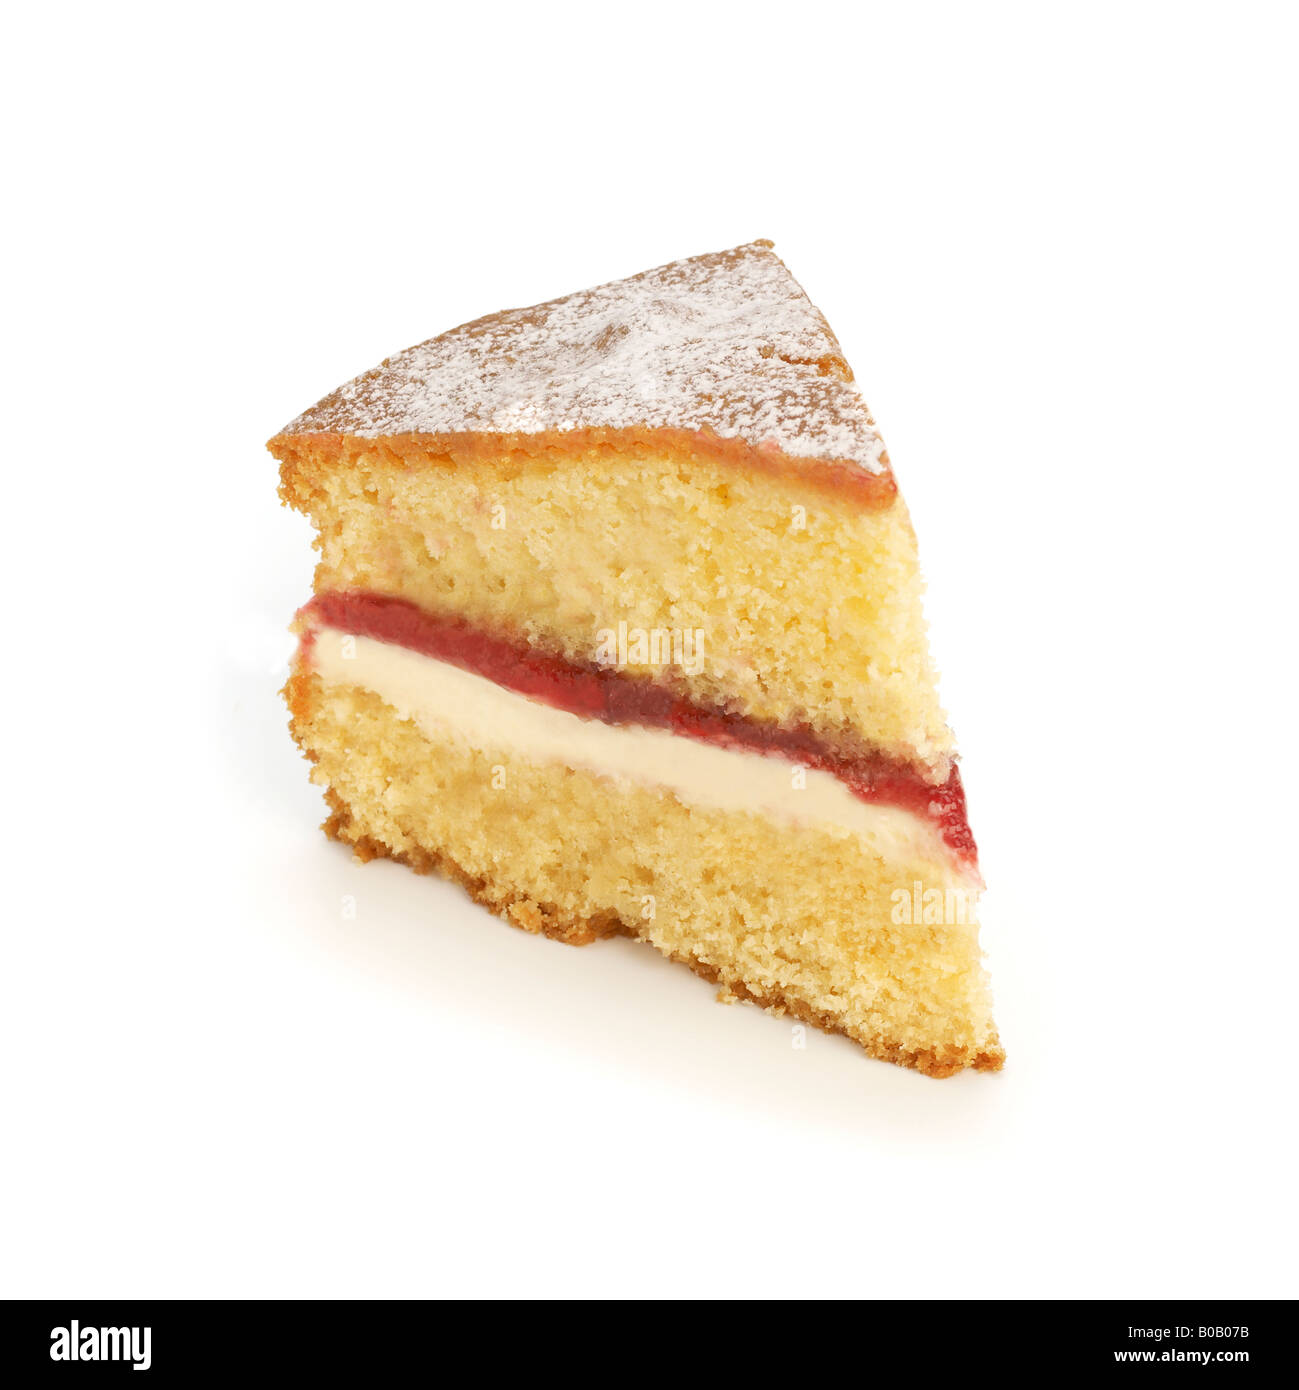 Round Sponge Cake